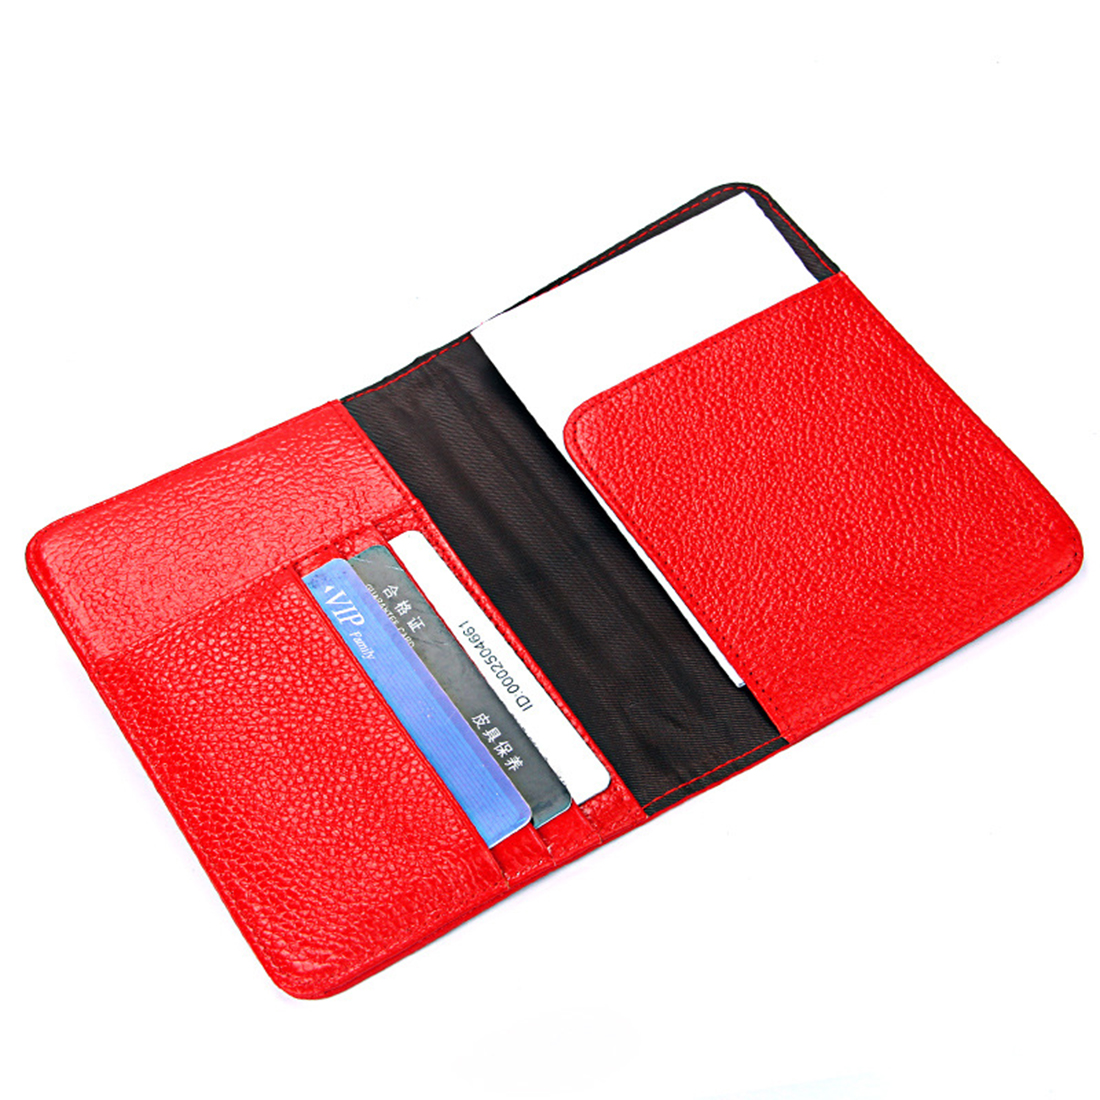 Leather Passport This Travel Multi-purpose Passport Holder